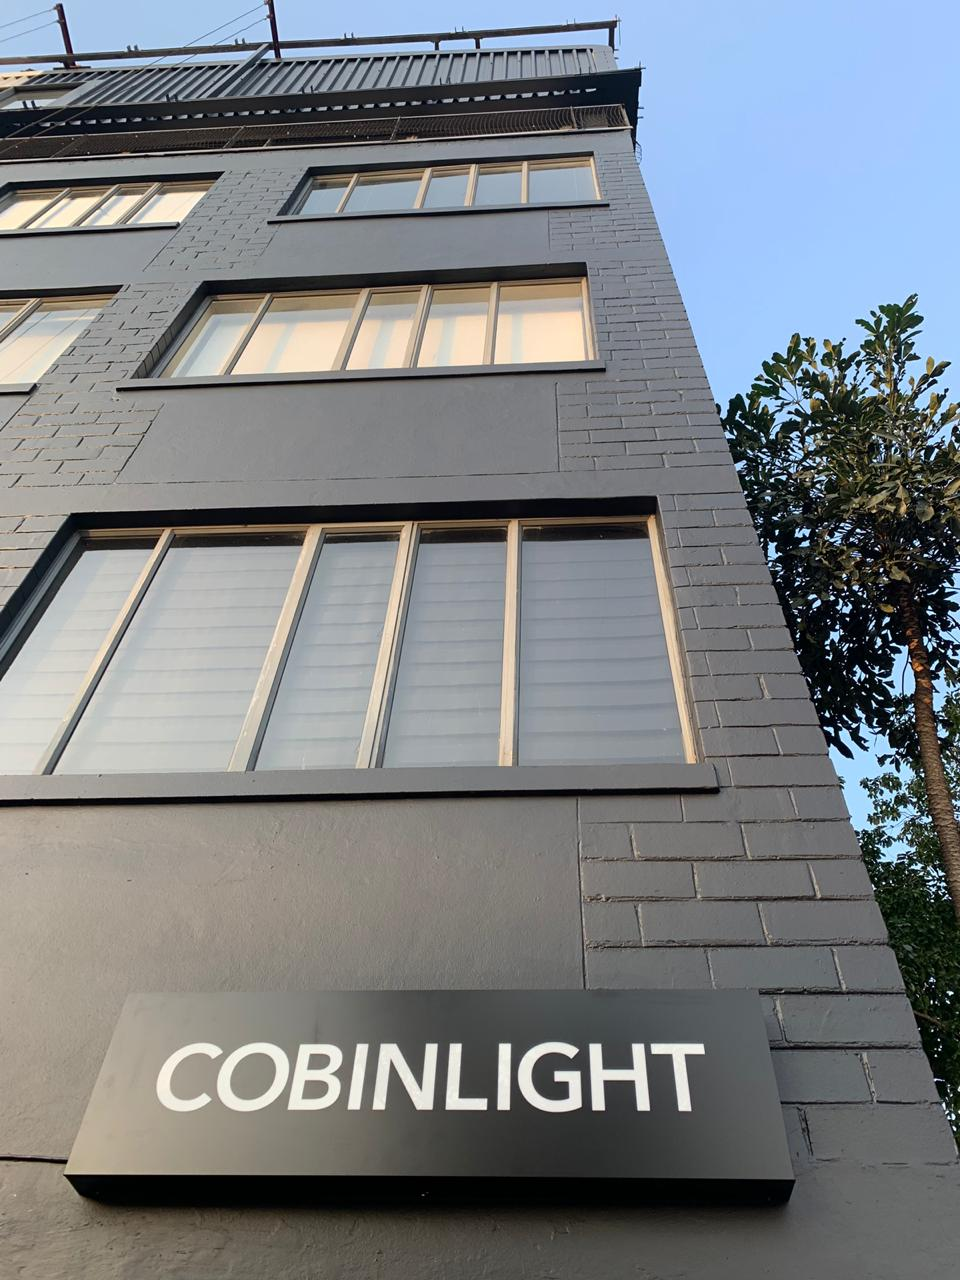 Cobin